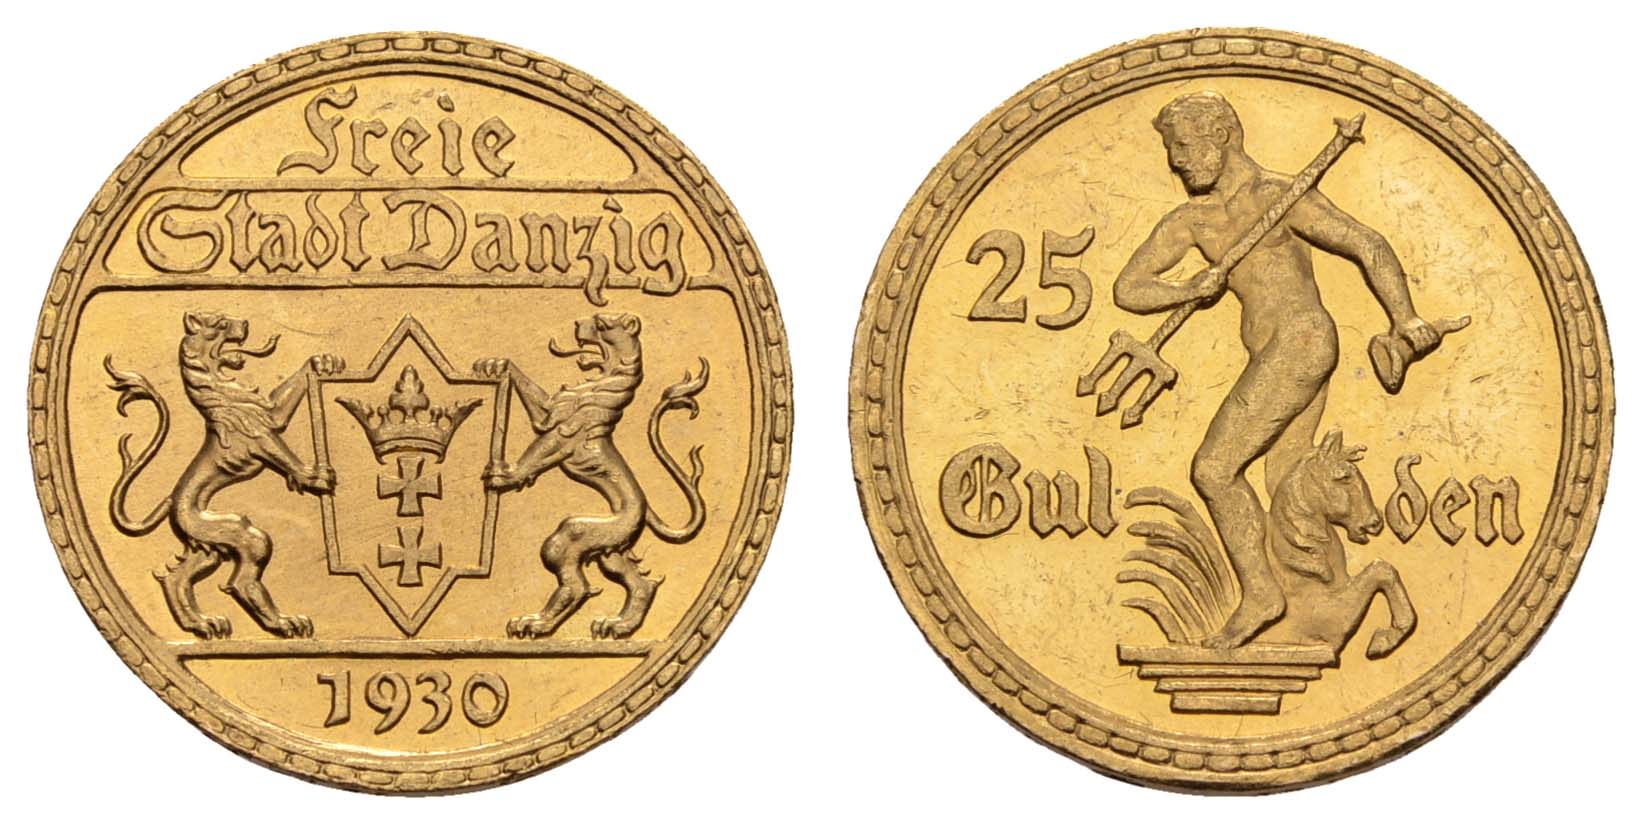 Lot 1103 - deutschland Nebengebiete - Danzig -  Auktionshaus Ulrich Felzmann GmbH & Co. KG Coins single lots